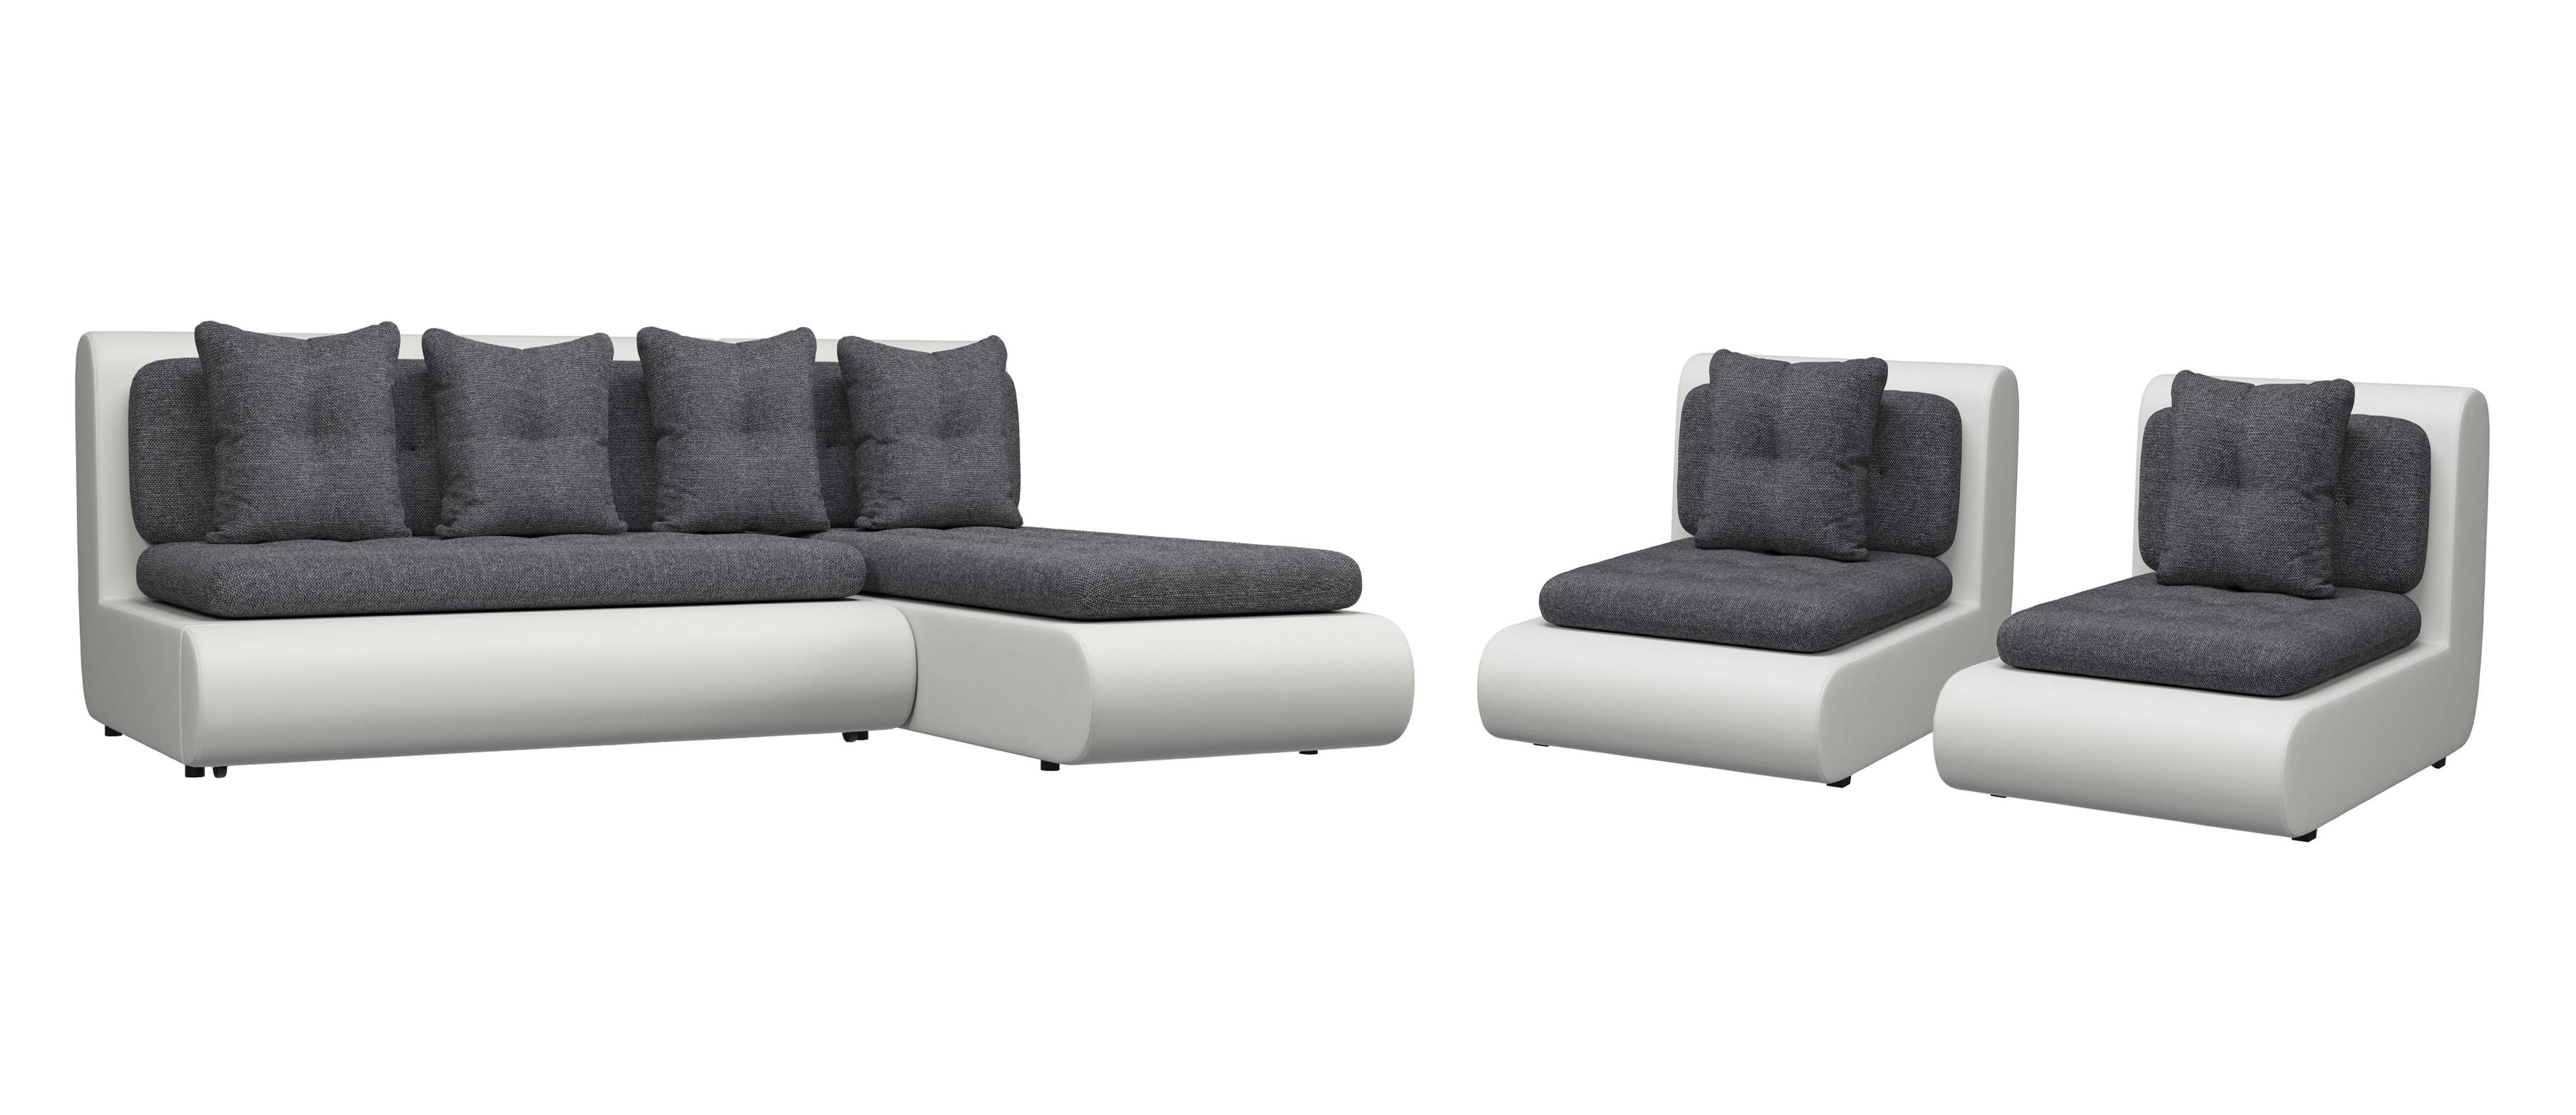 Комплект мягкой мебели Кормак eglo 90626